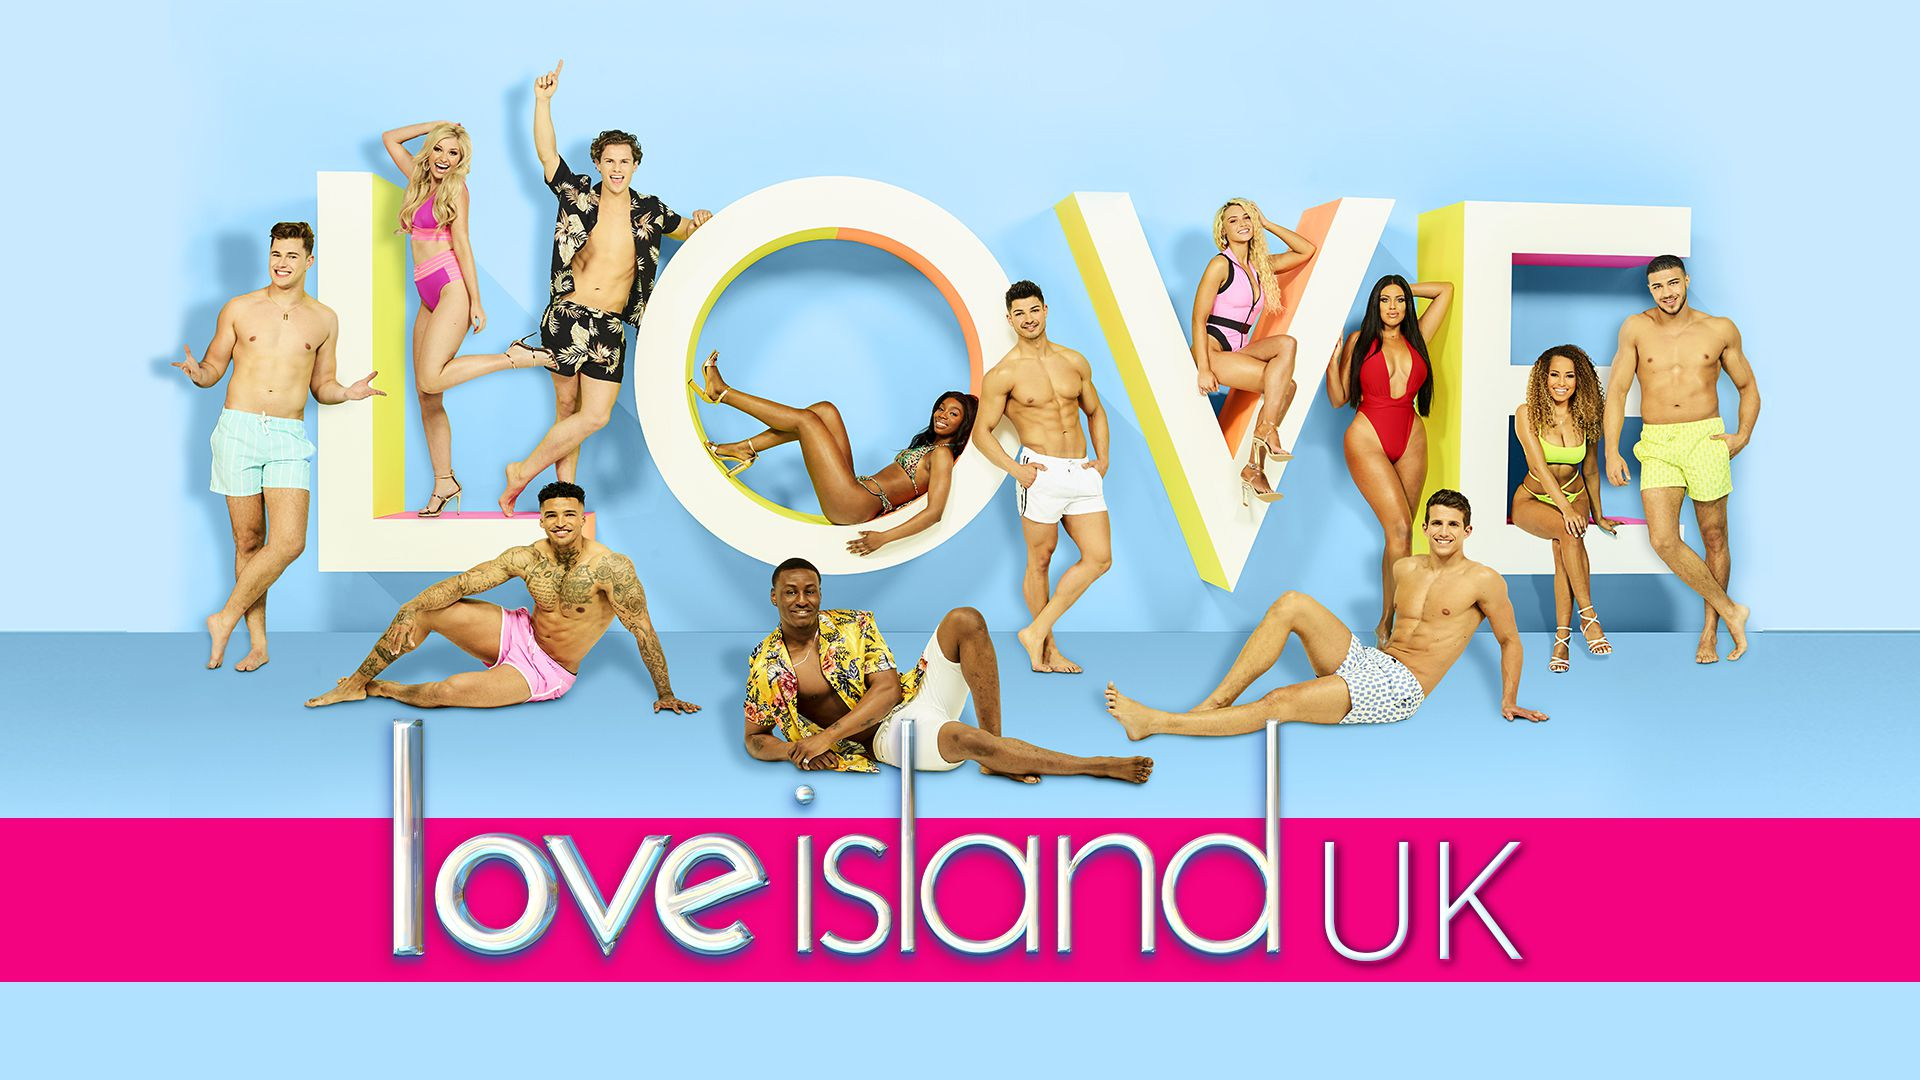 Watch Love Island UK Season 5, Catch Up TV